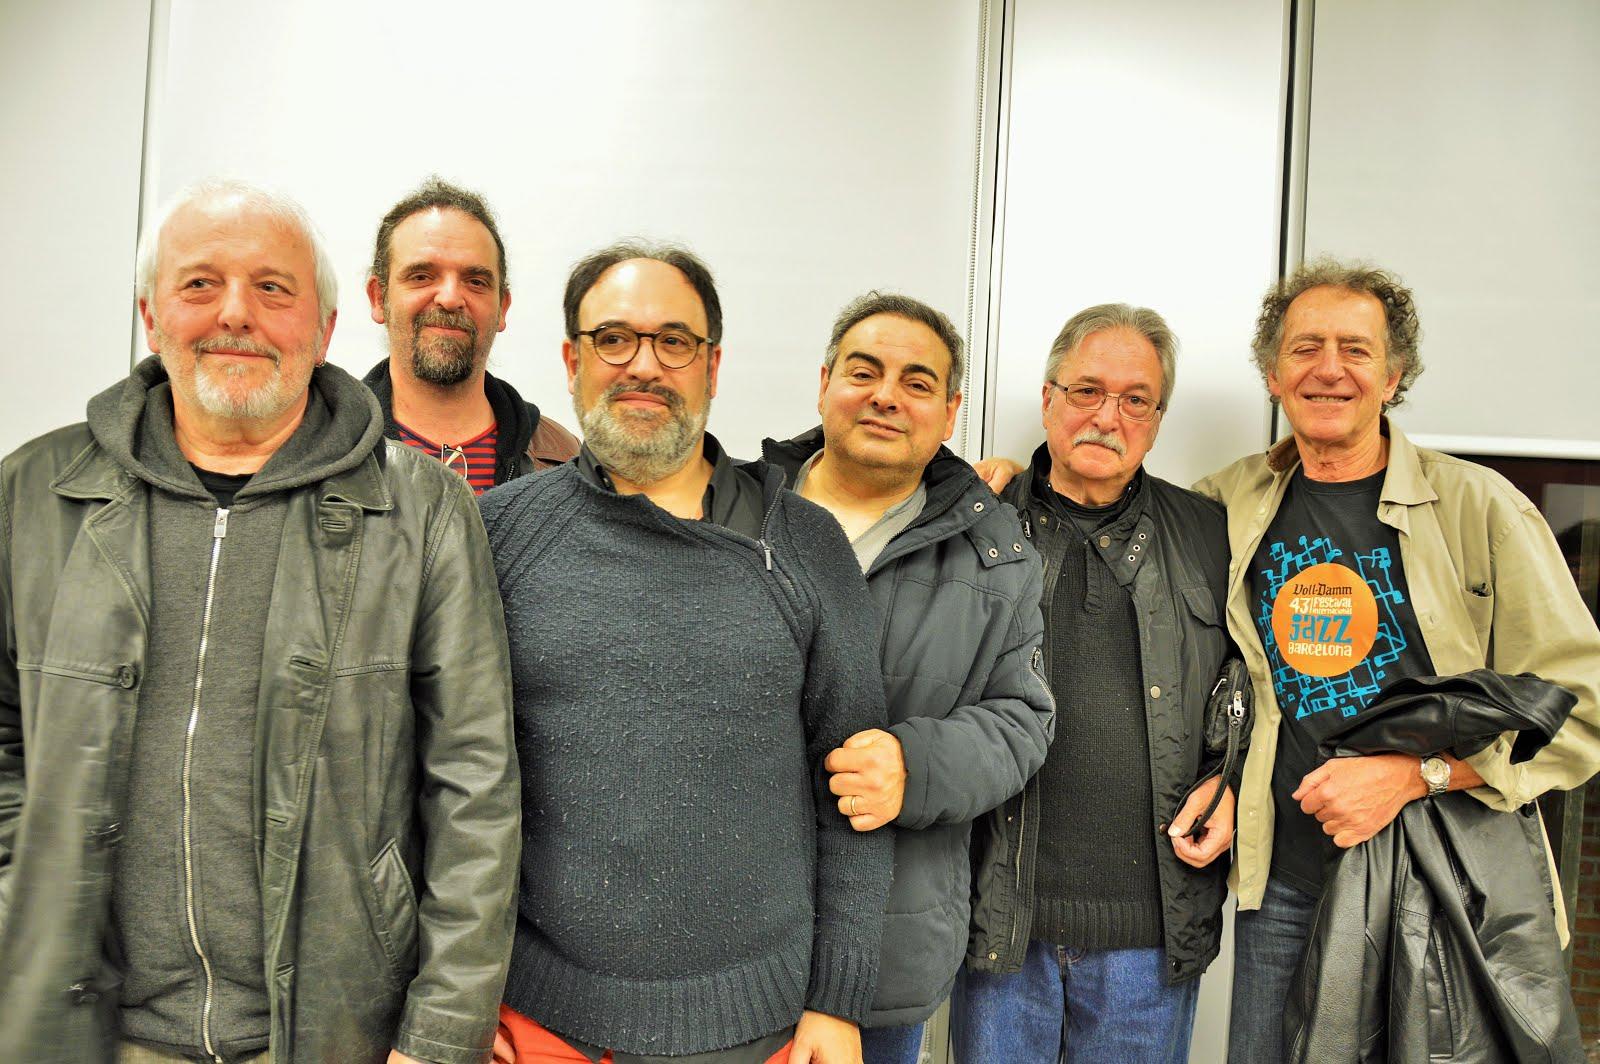 Amb Max Sunyer, Jordi Batiste, Jordi Sabatés, Jordi Gomara i Joan Casamor